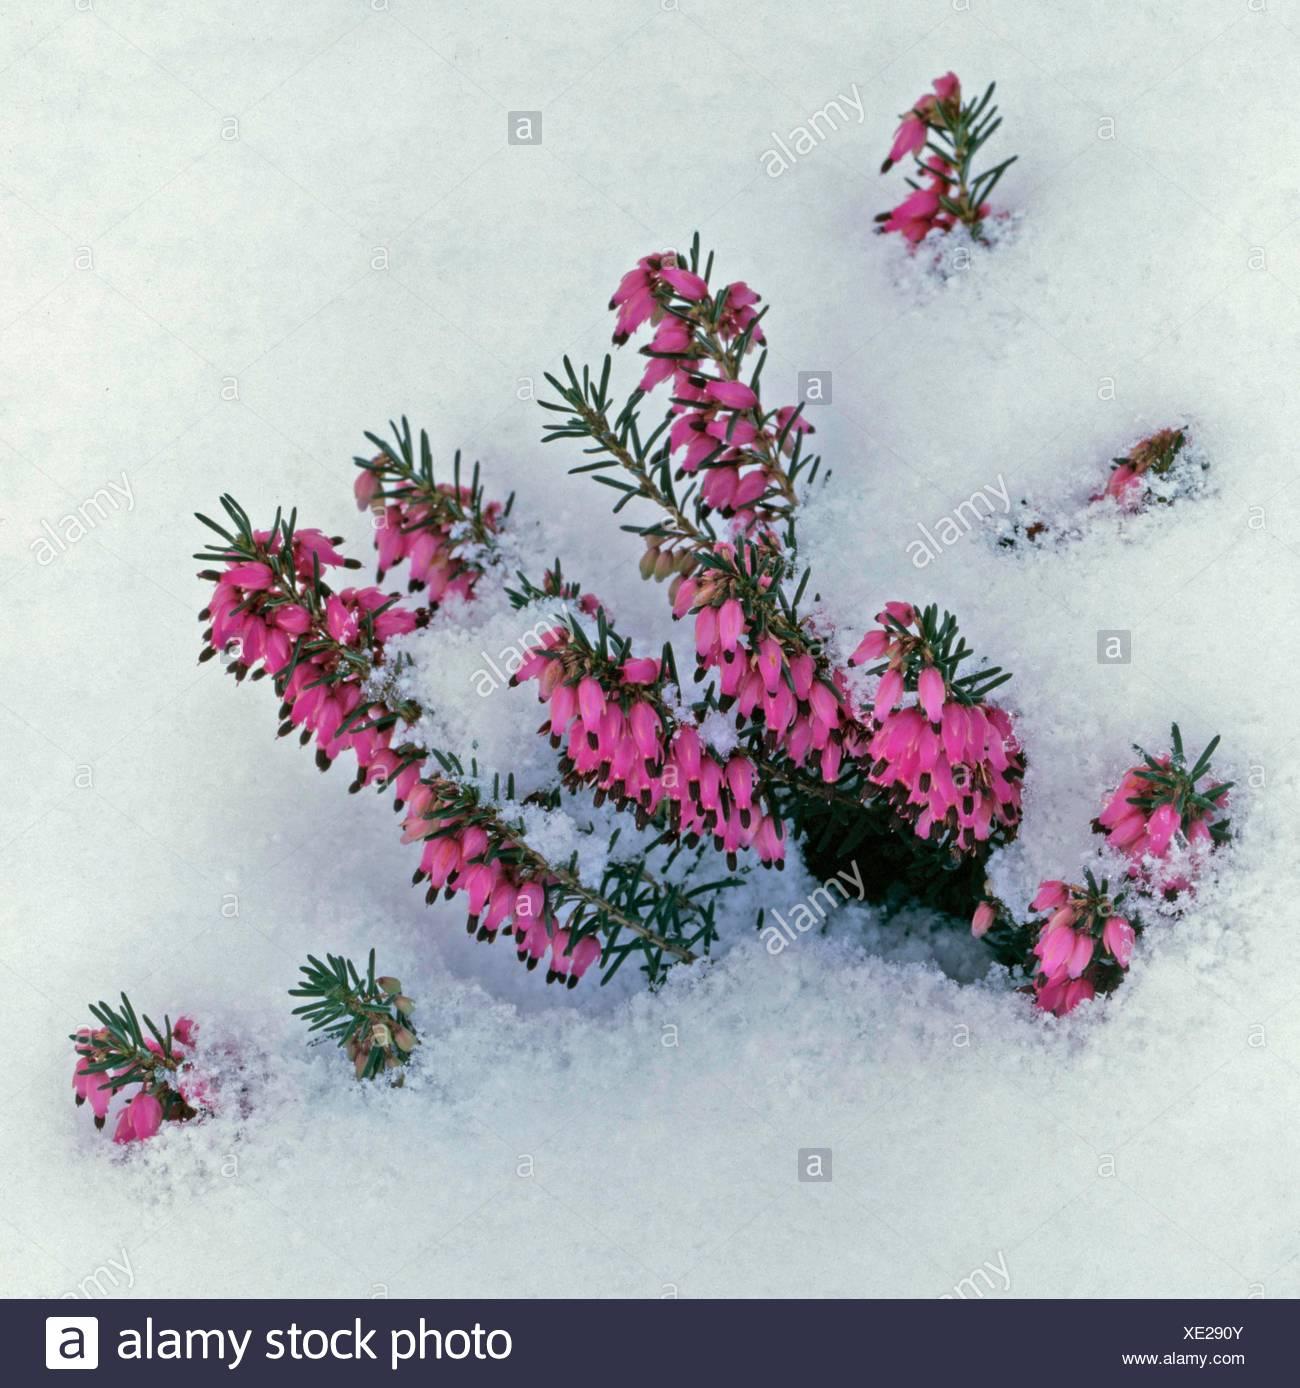 Erica carnea - `Myretoun Ruby' AGM in Snow   ERC012043 - Stock Image